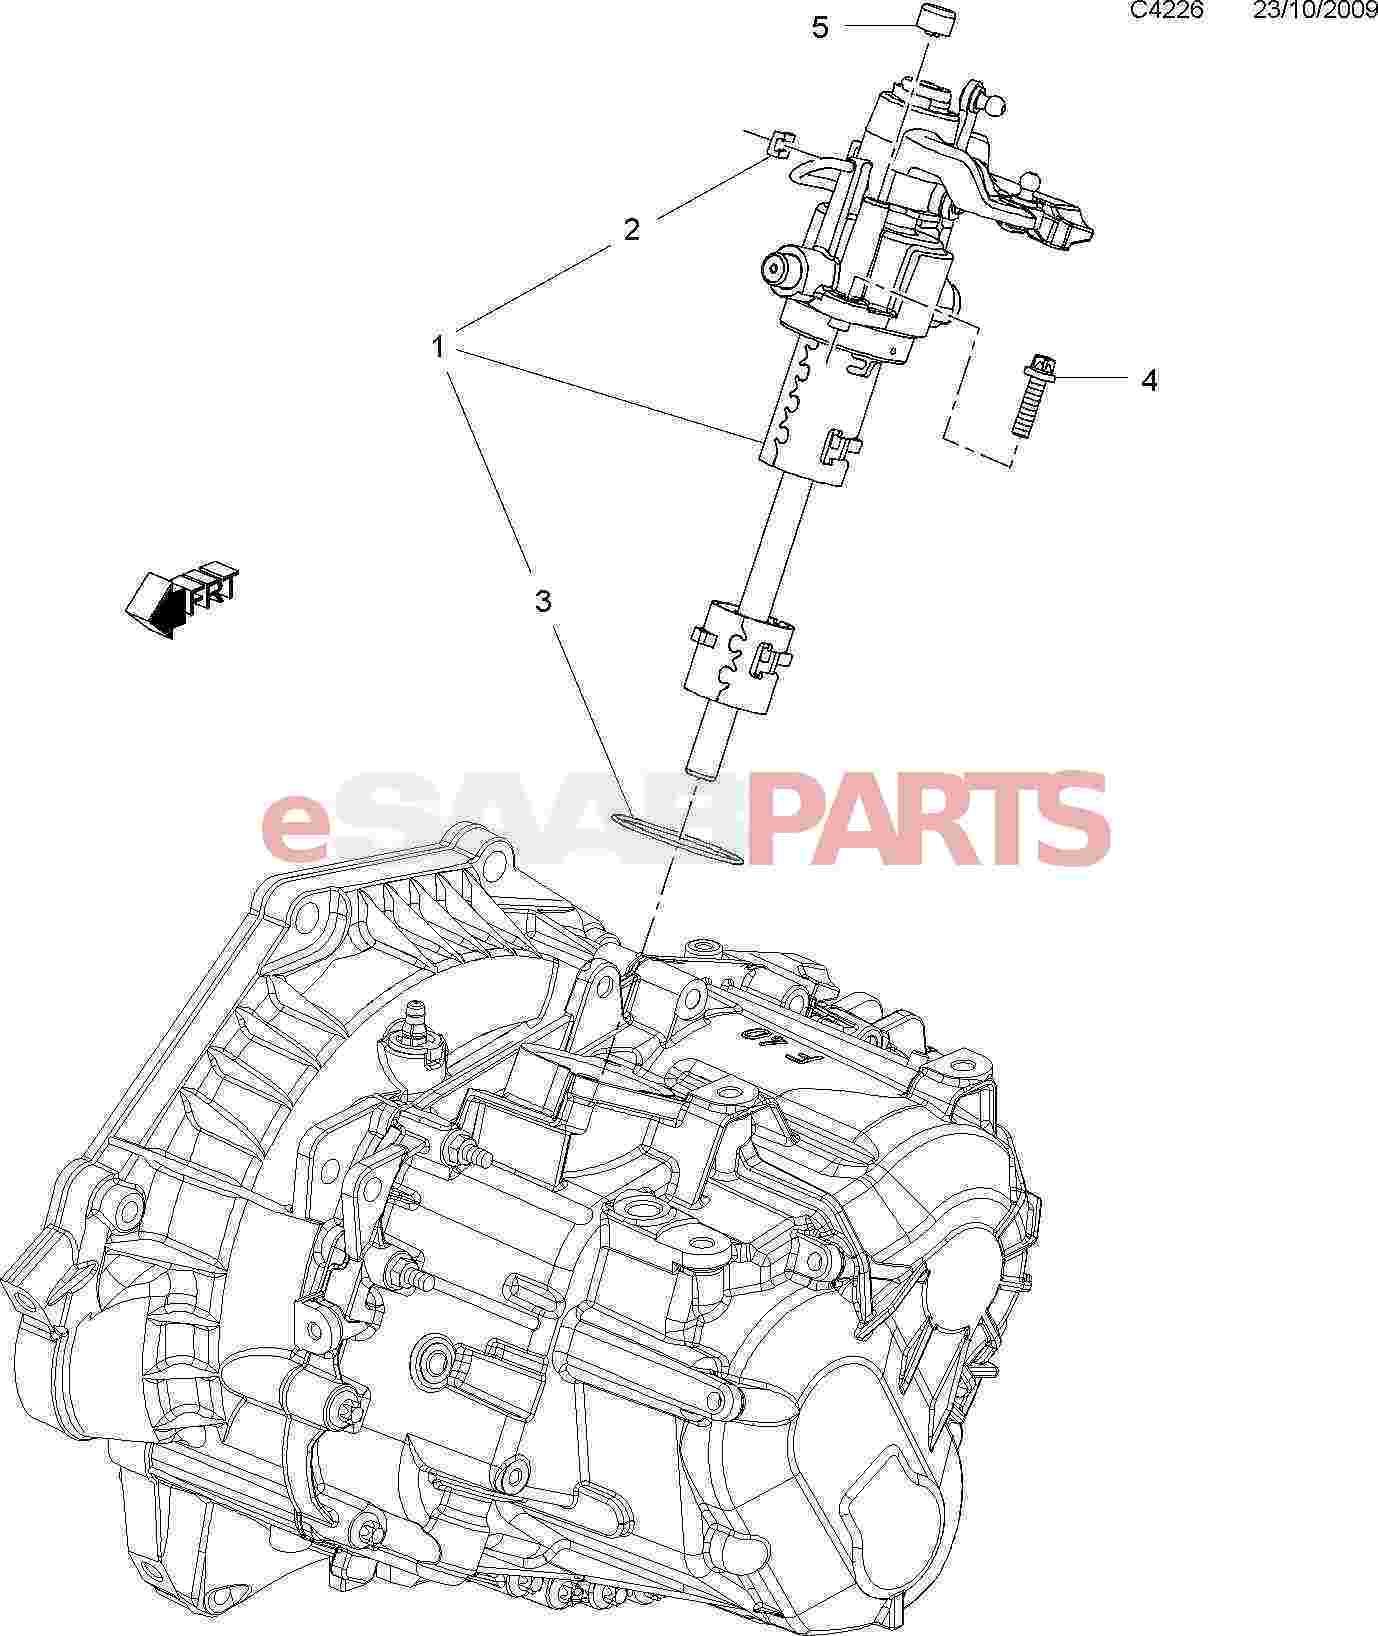 Saab 900 Transmission Diagram Electrical Wiring Diagrams 1997 Manual Find U2022